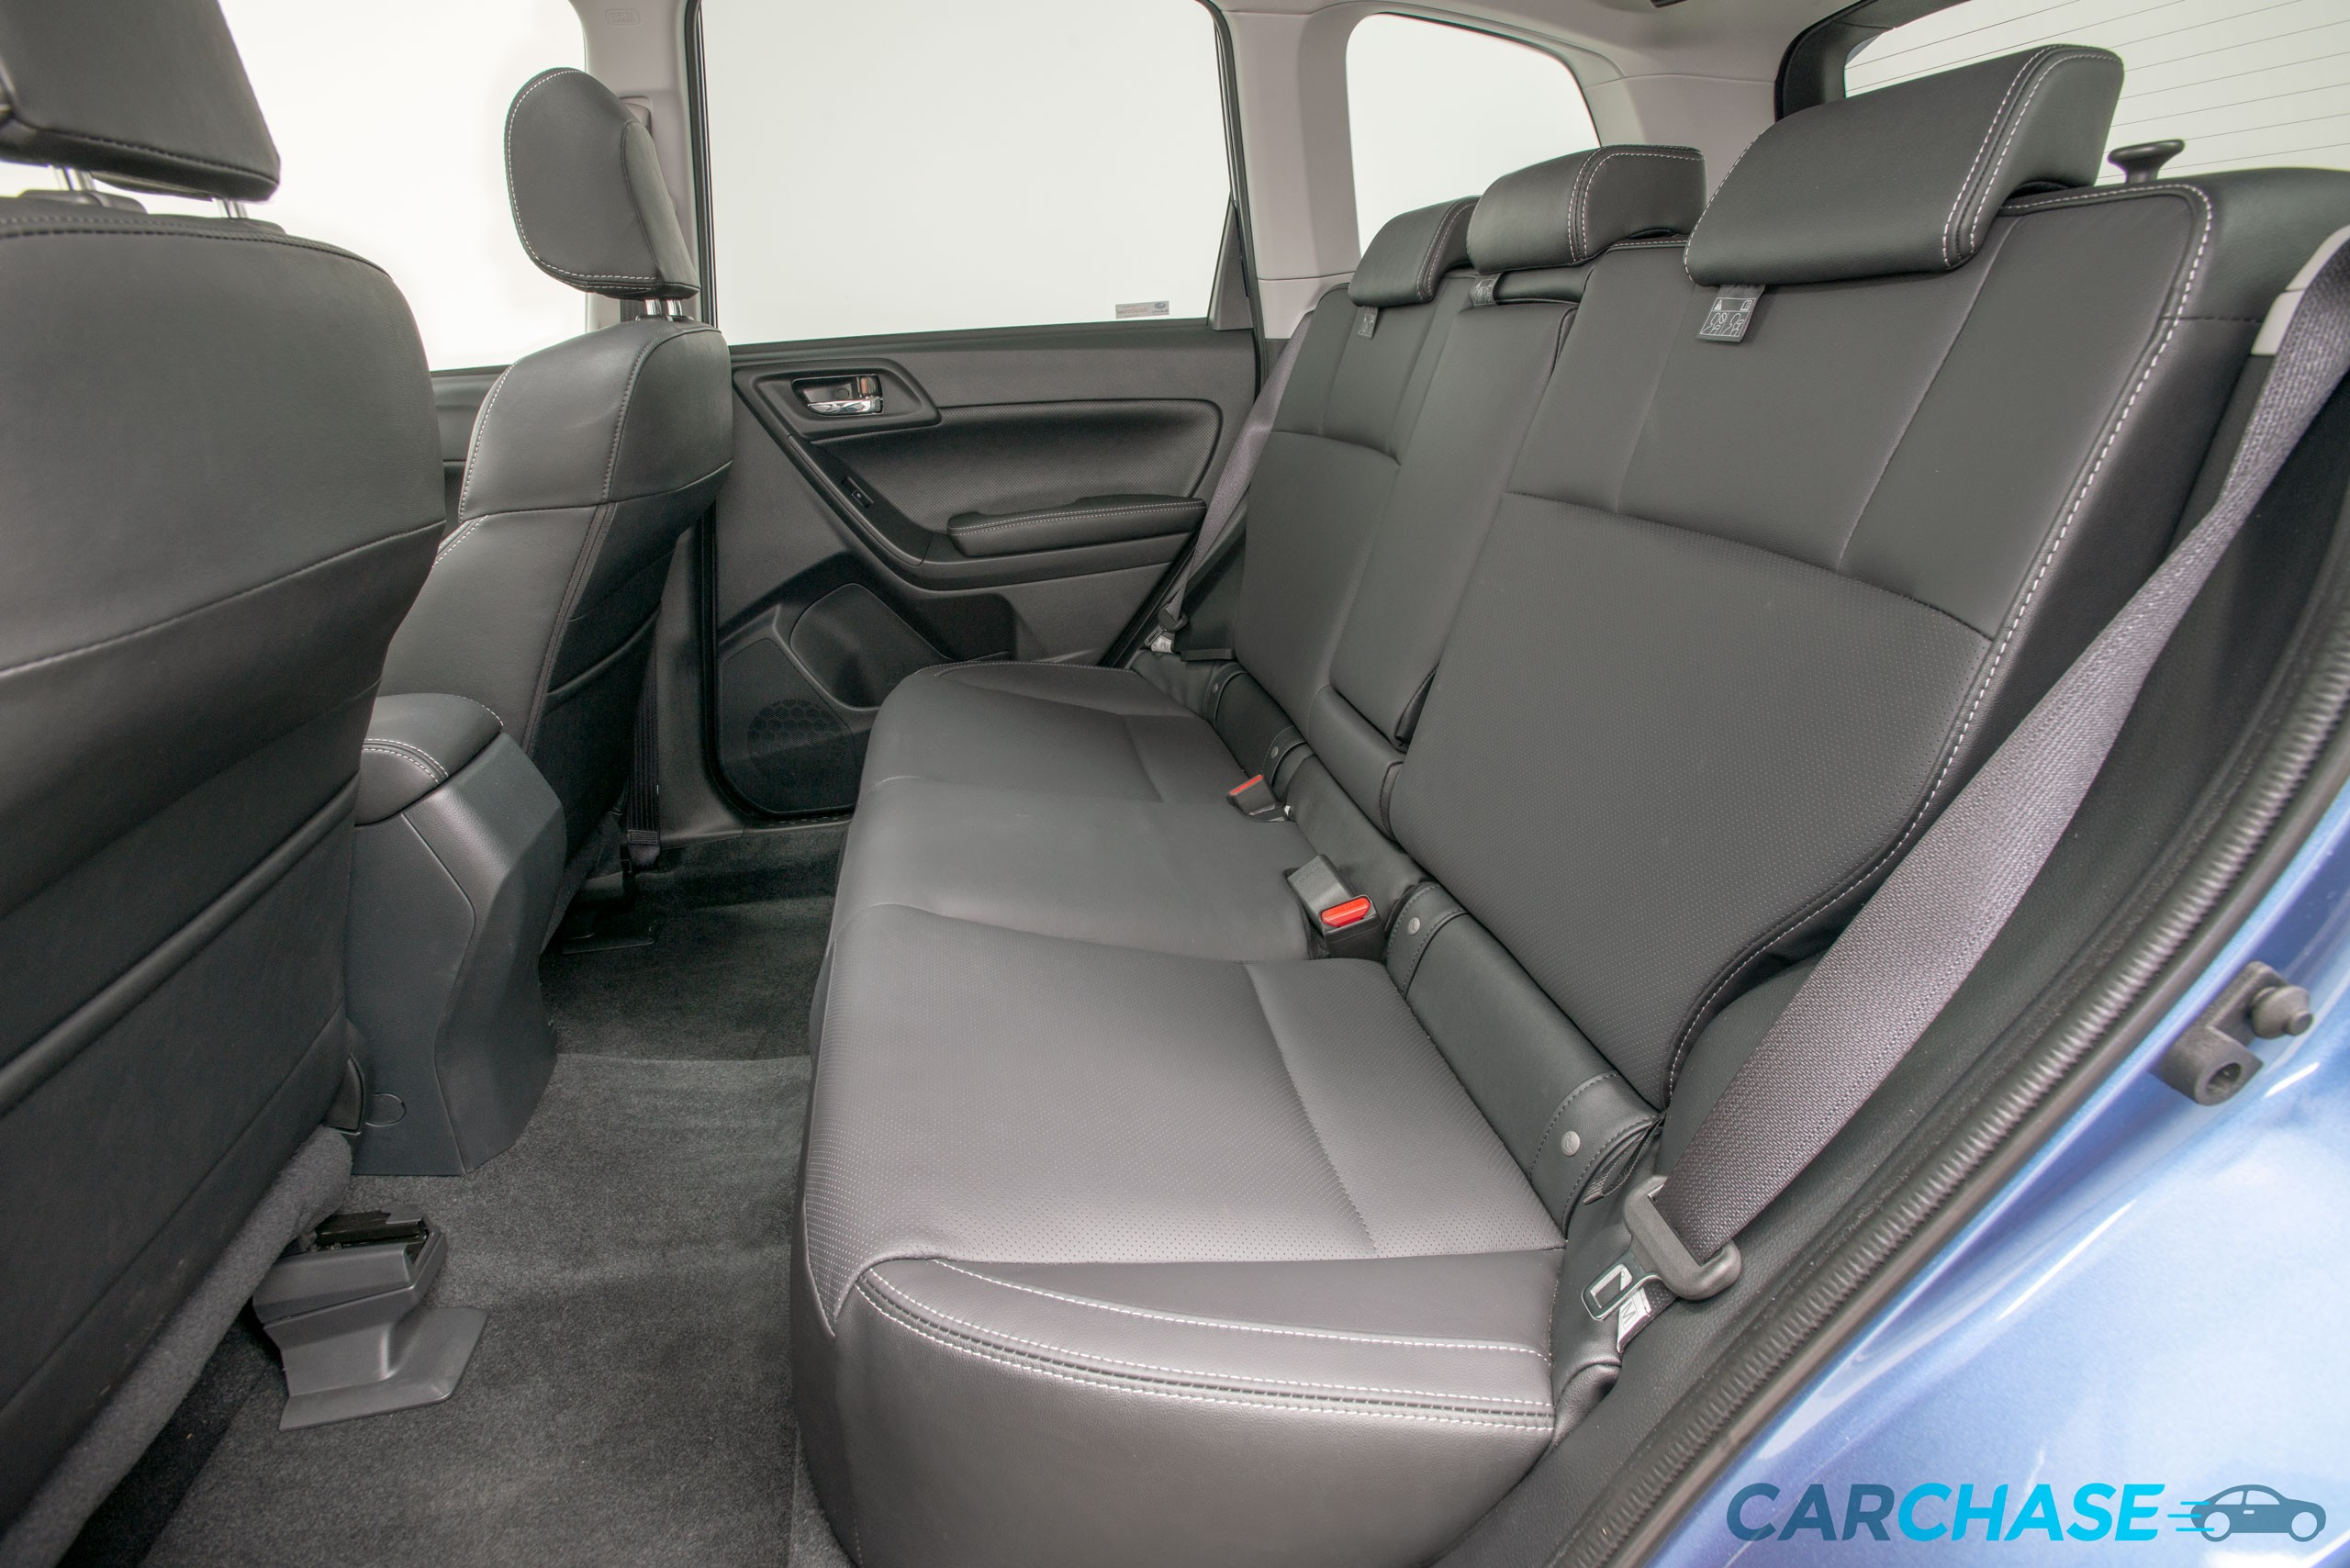 Image of passenger rear profile of 2018 Subaru Forester 2.5i-L Luxury